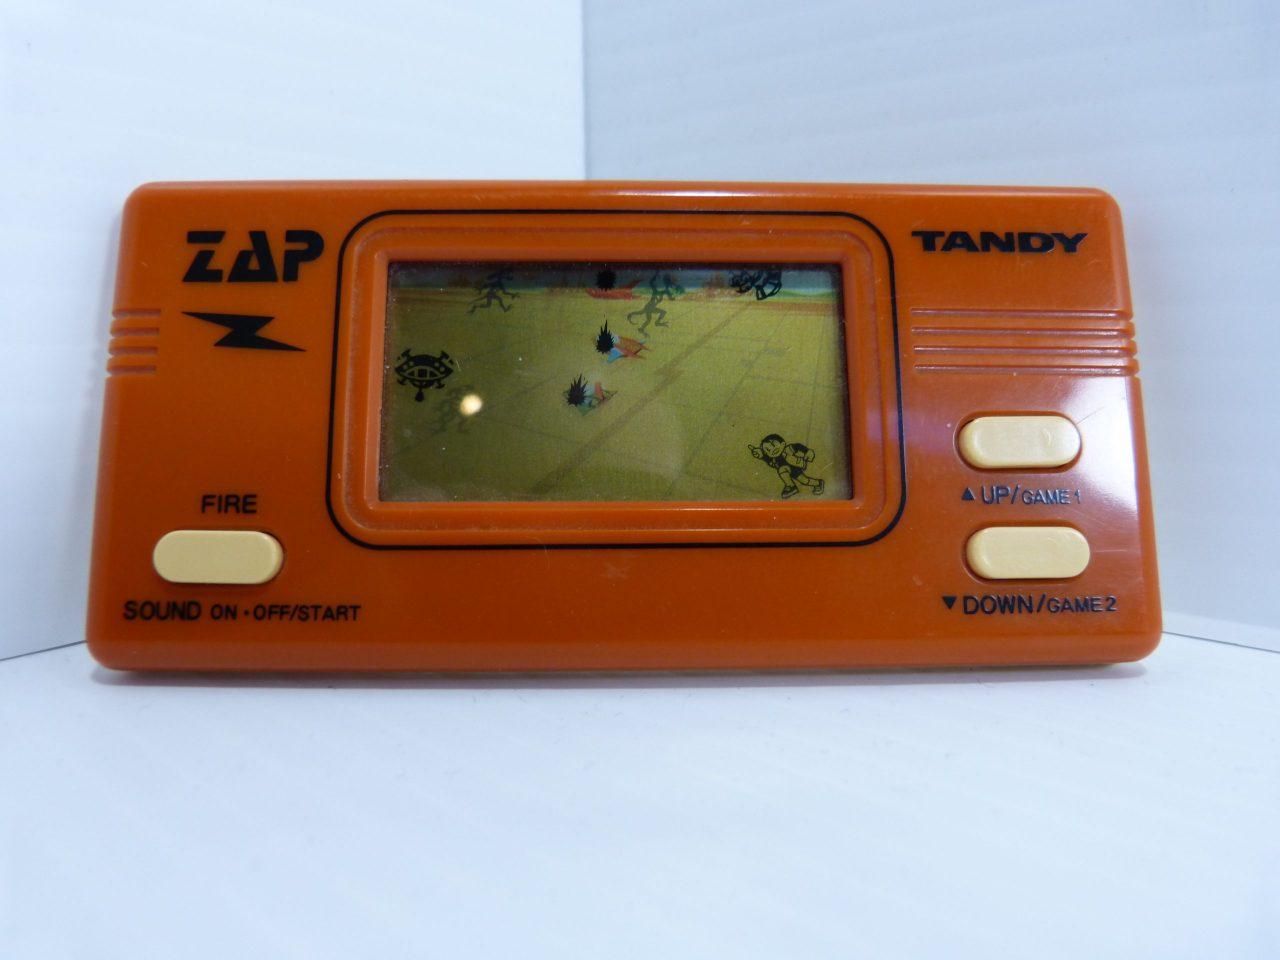 Tandy Zap Handheld Electronic Game